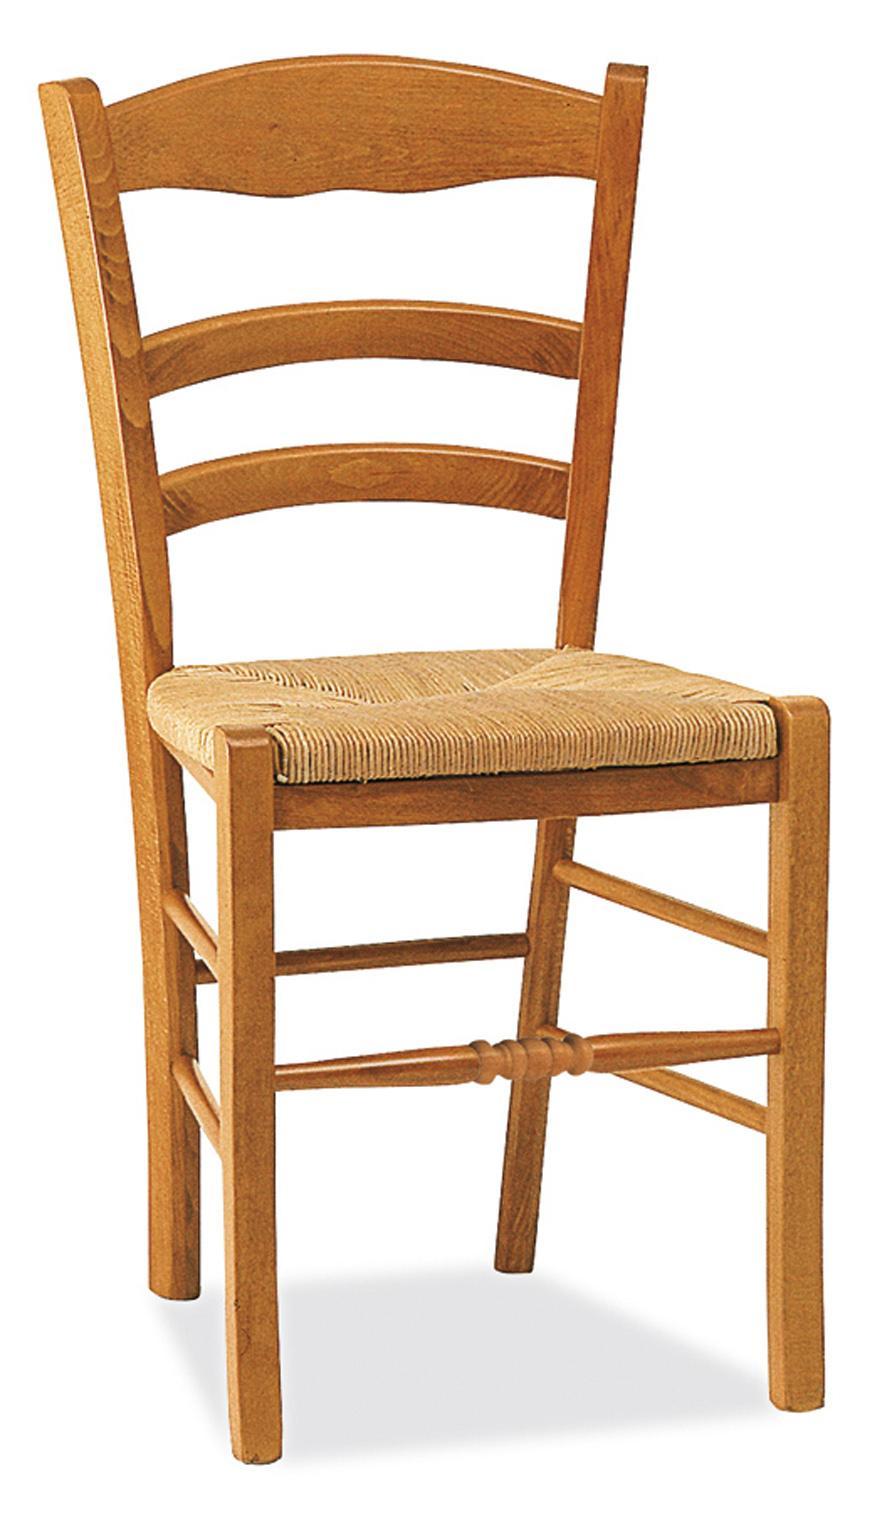 114 Sedie Design Napoli - seduta per ufficio resistente ed ...